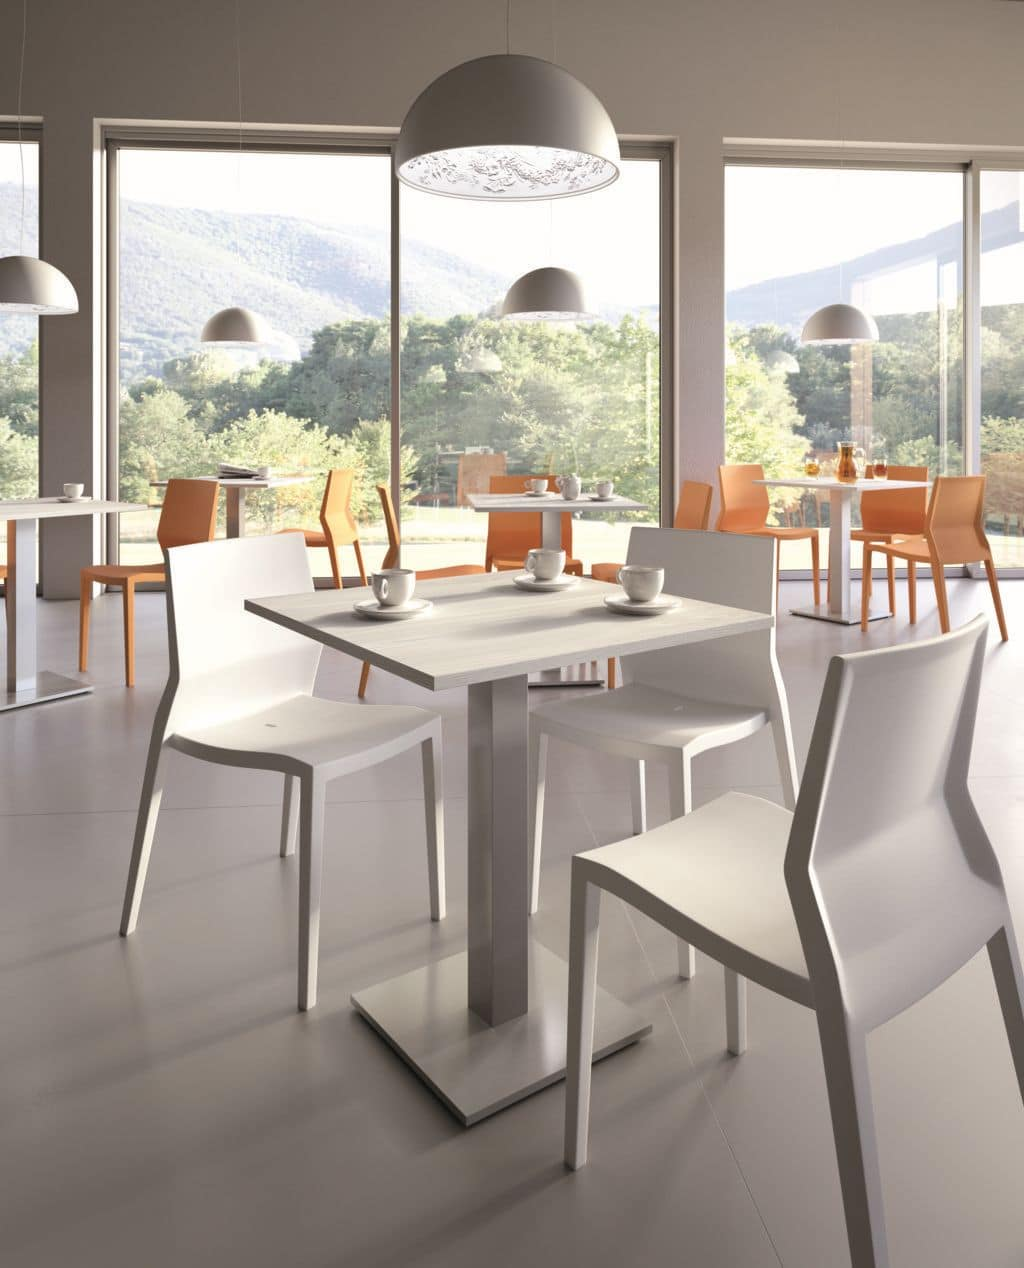 Home Arredo Tavoli Tavoli Caio #945937 1024 1268 Ikea Tavoli In Vetro